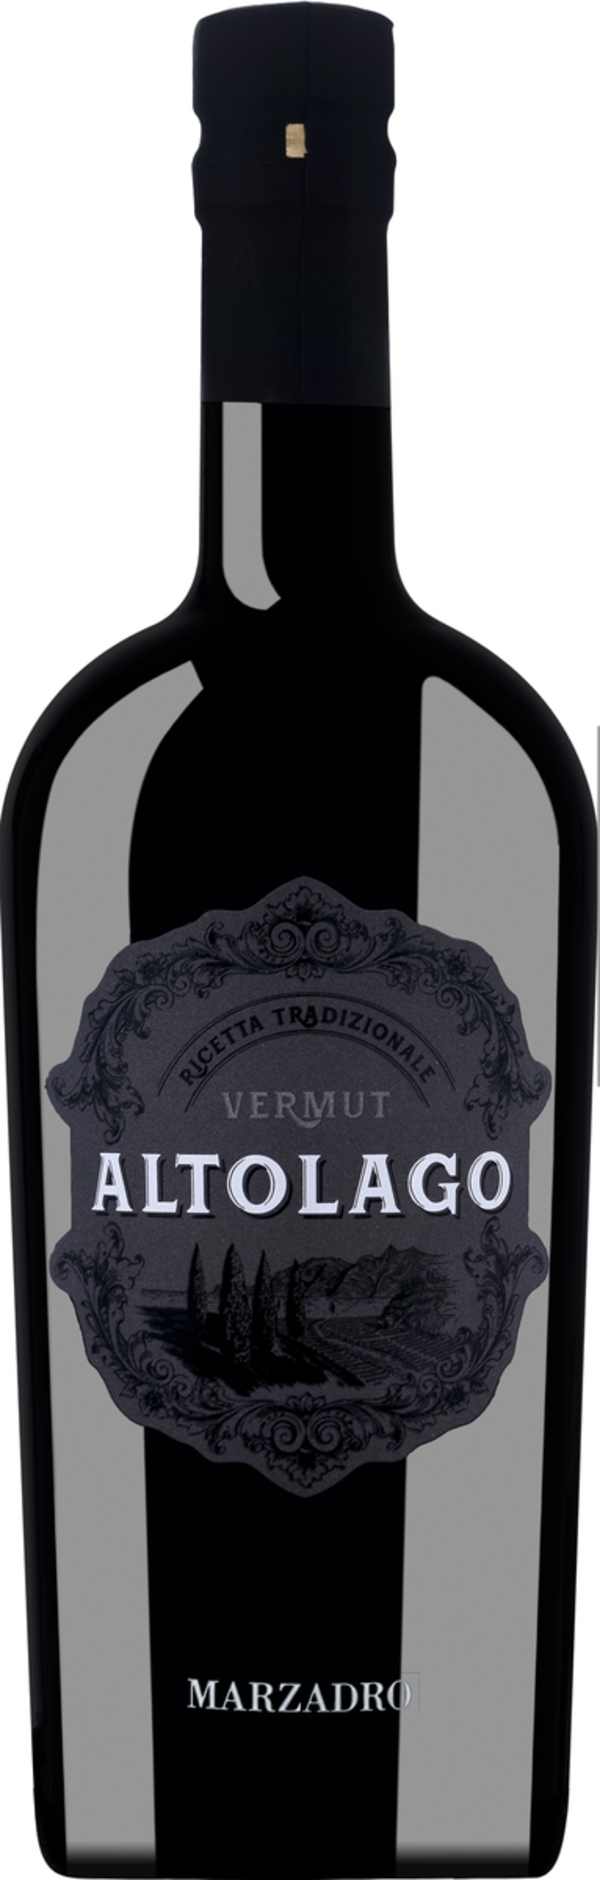 Marzadro Altolago Vermut Ricetta Tradizionale   - Wermut, Italien, halbtrocken, 0,75l